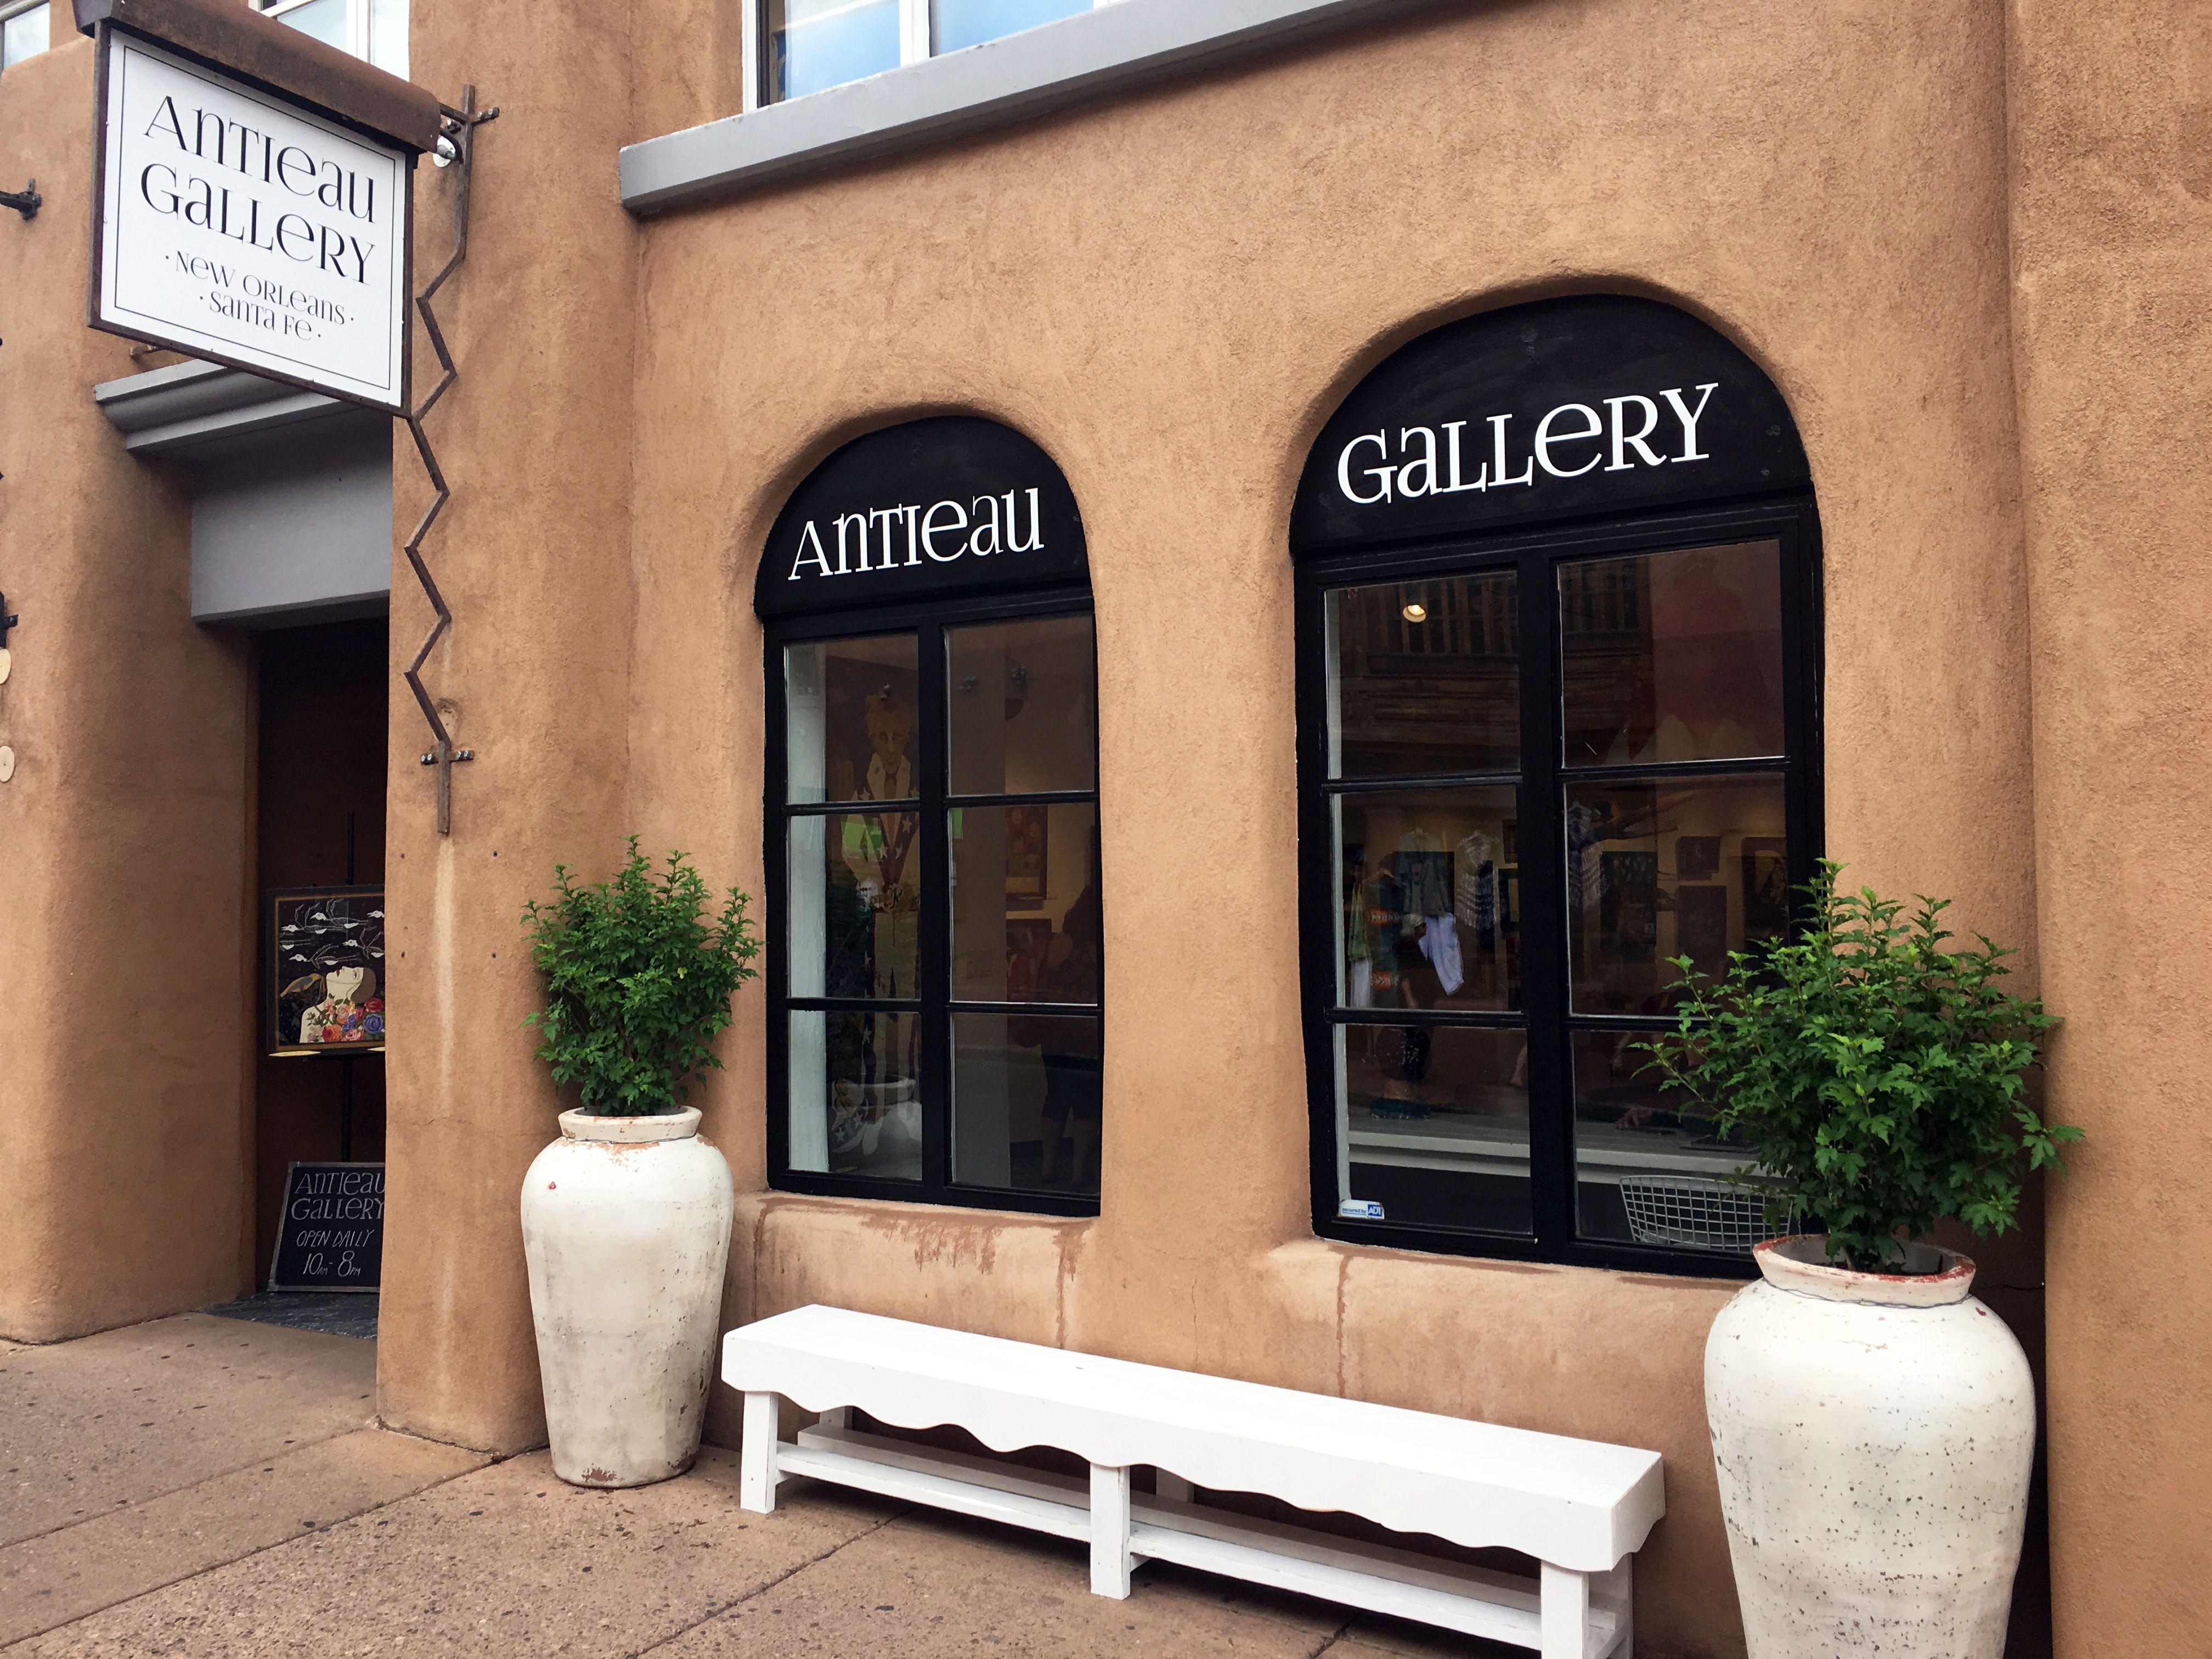 Antieau gallery santa fe 134 w water street with images